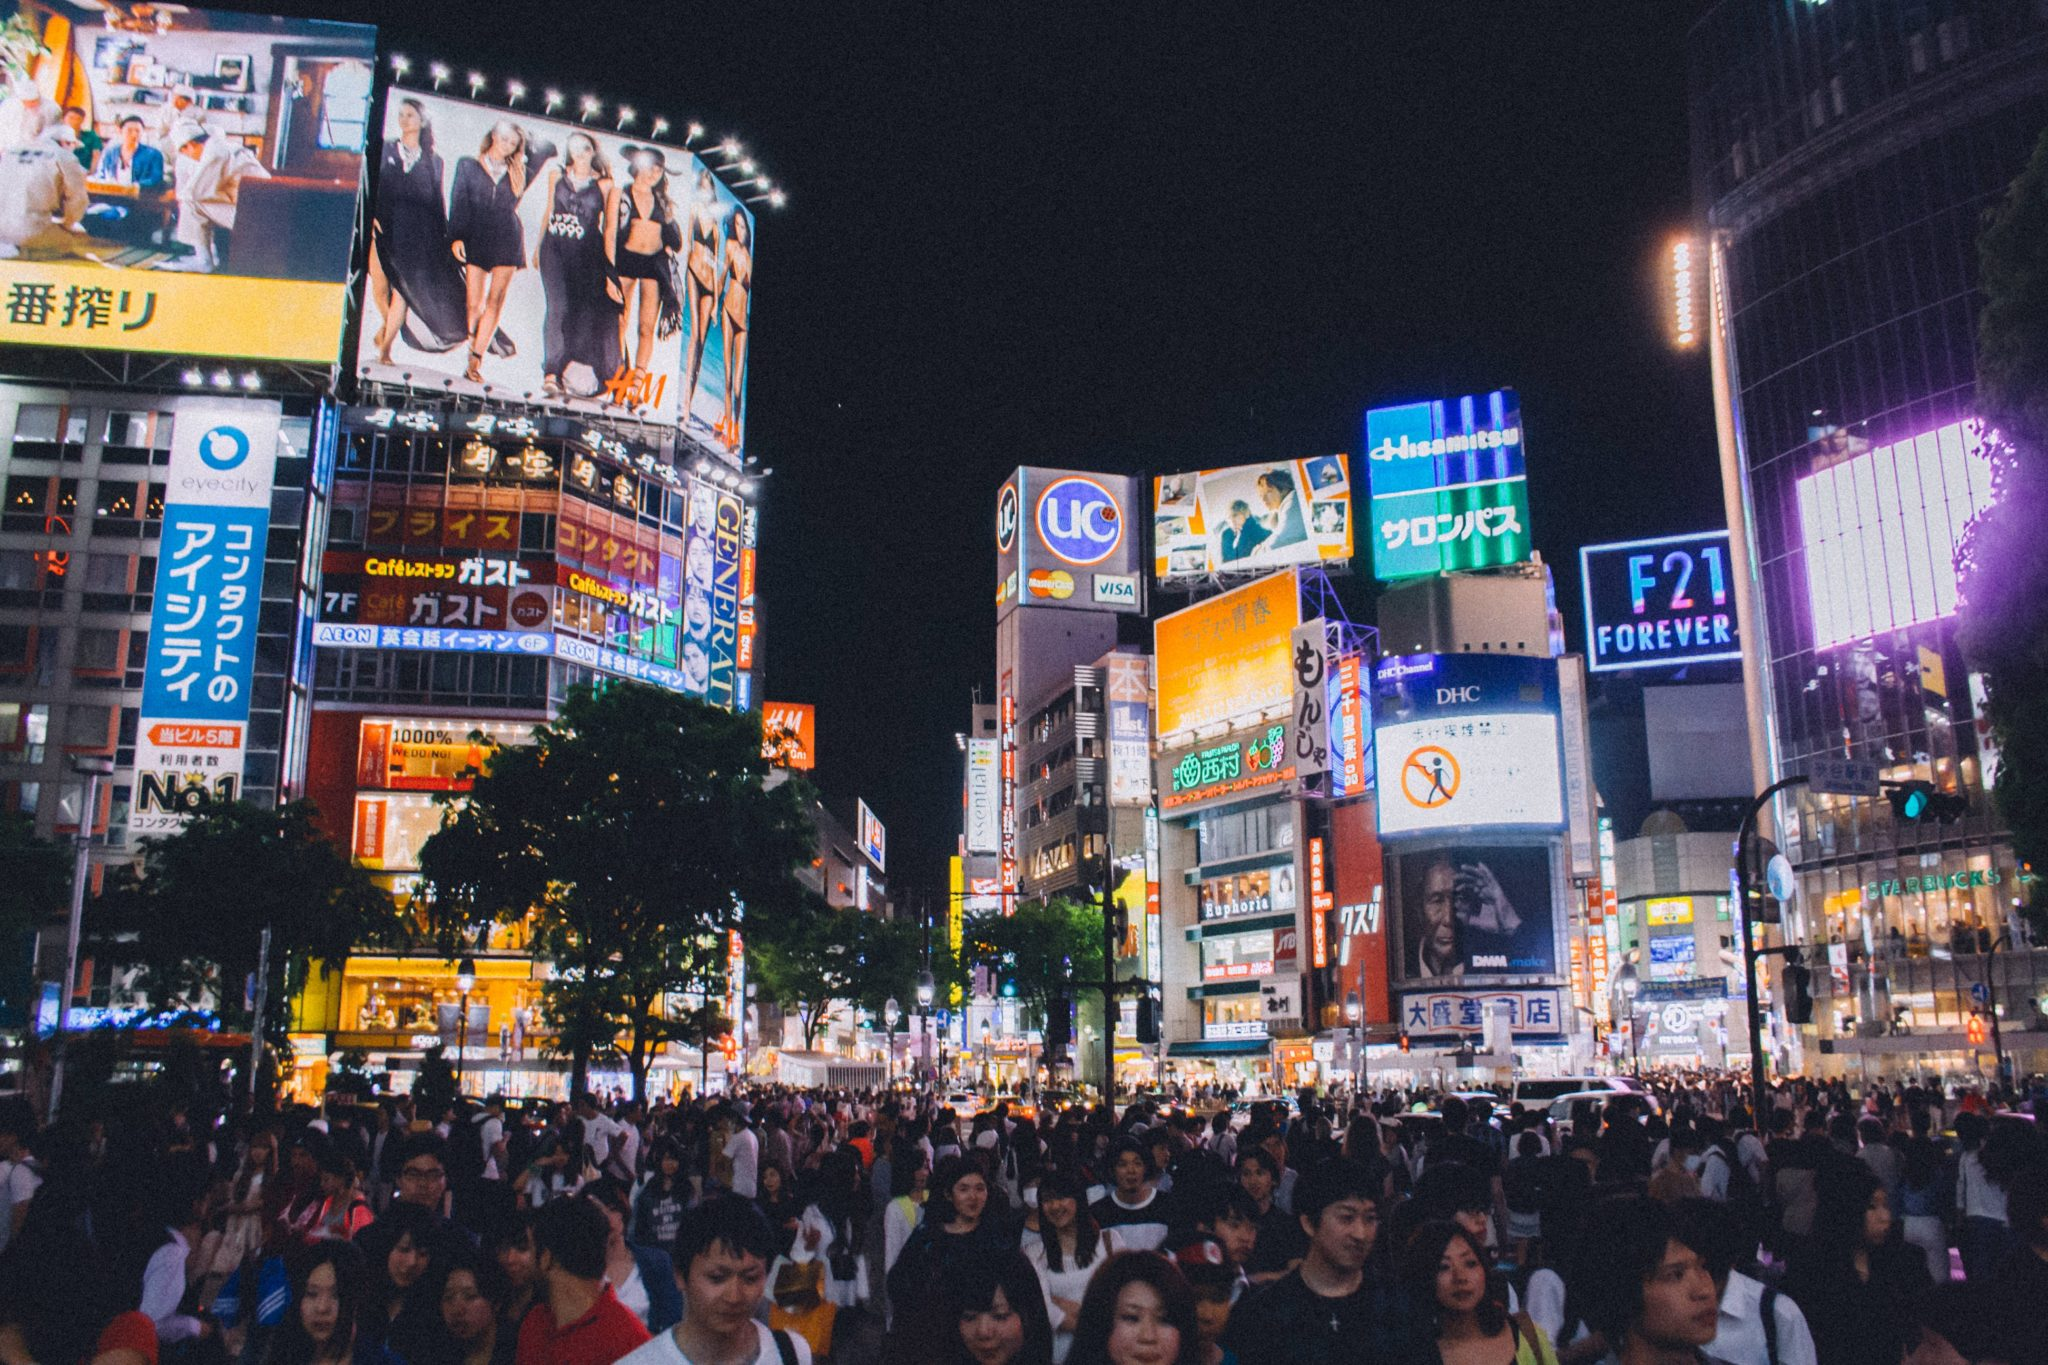 flights to Australia - Top layover destinations Tokyo at night